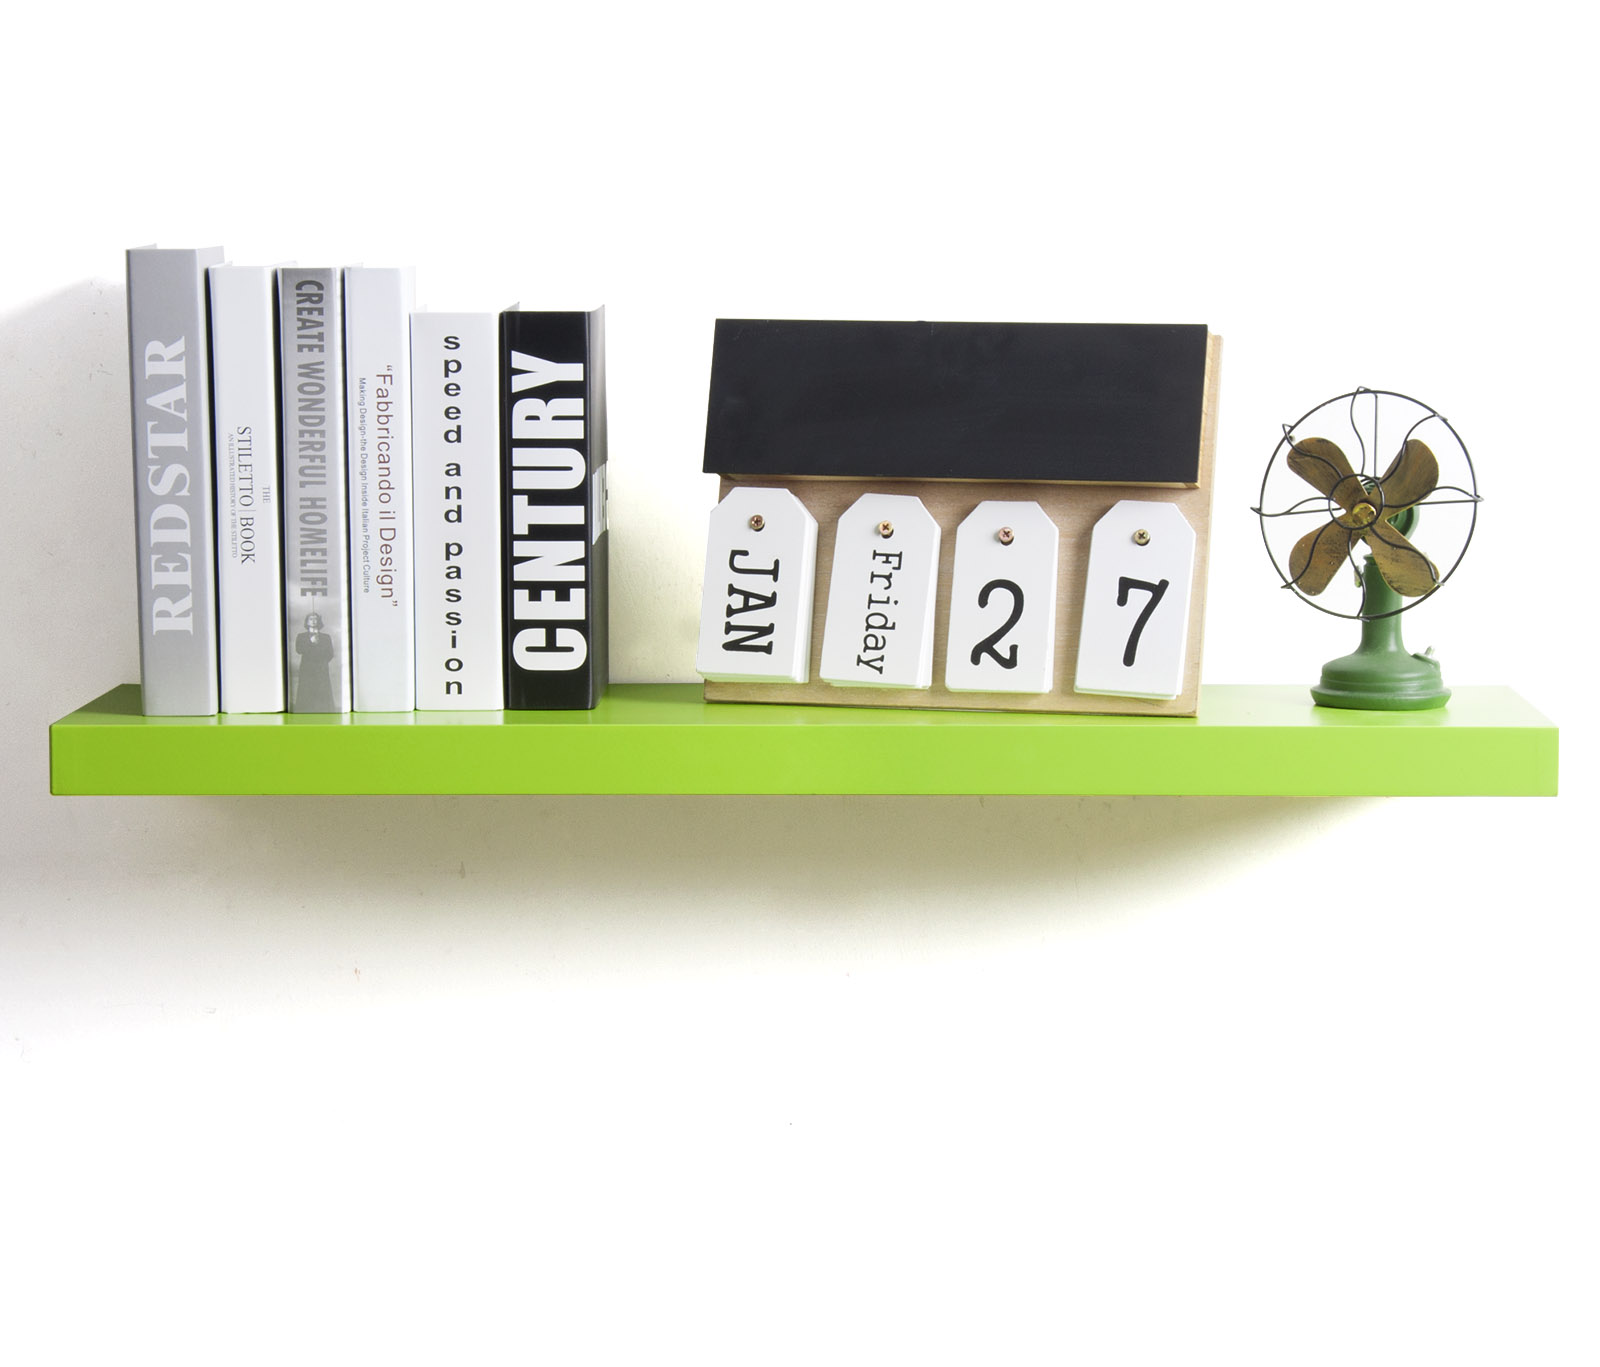 Wandregal Wandboard Bücherregal Board Regal in vielen Farben und ...